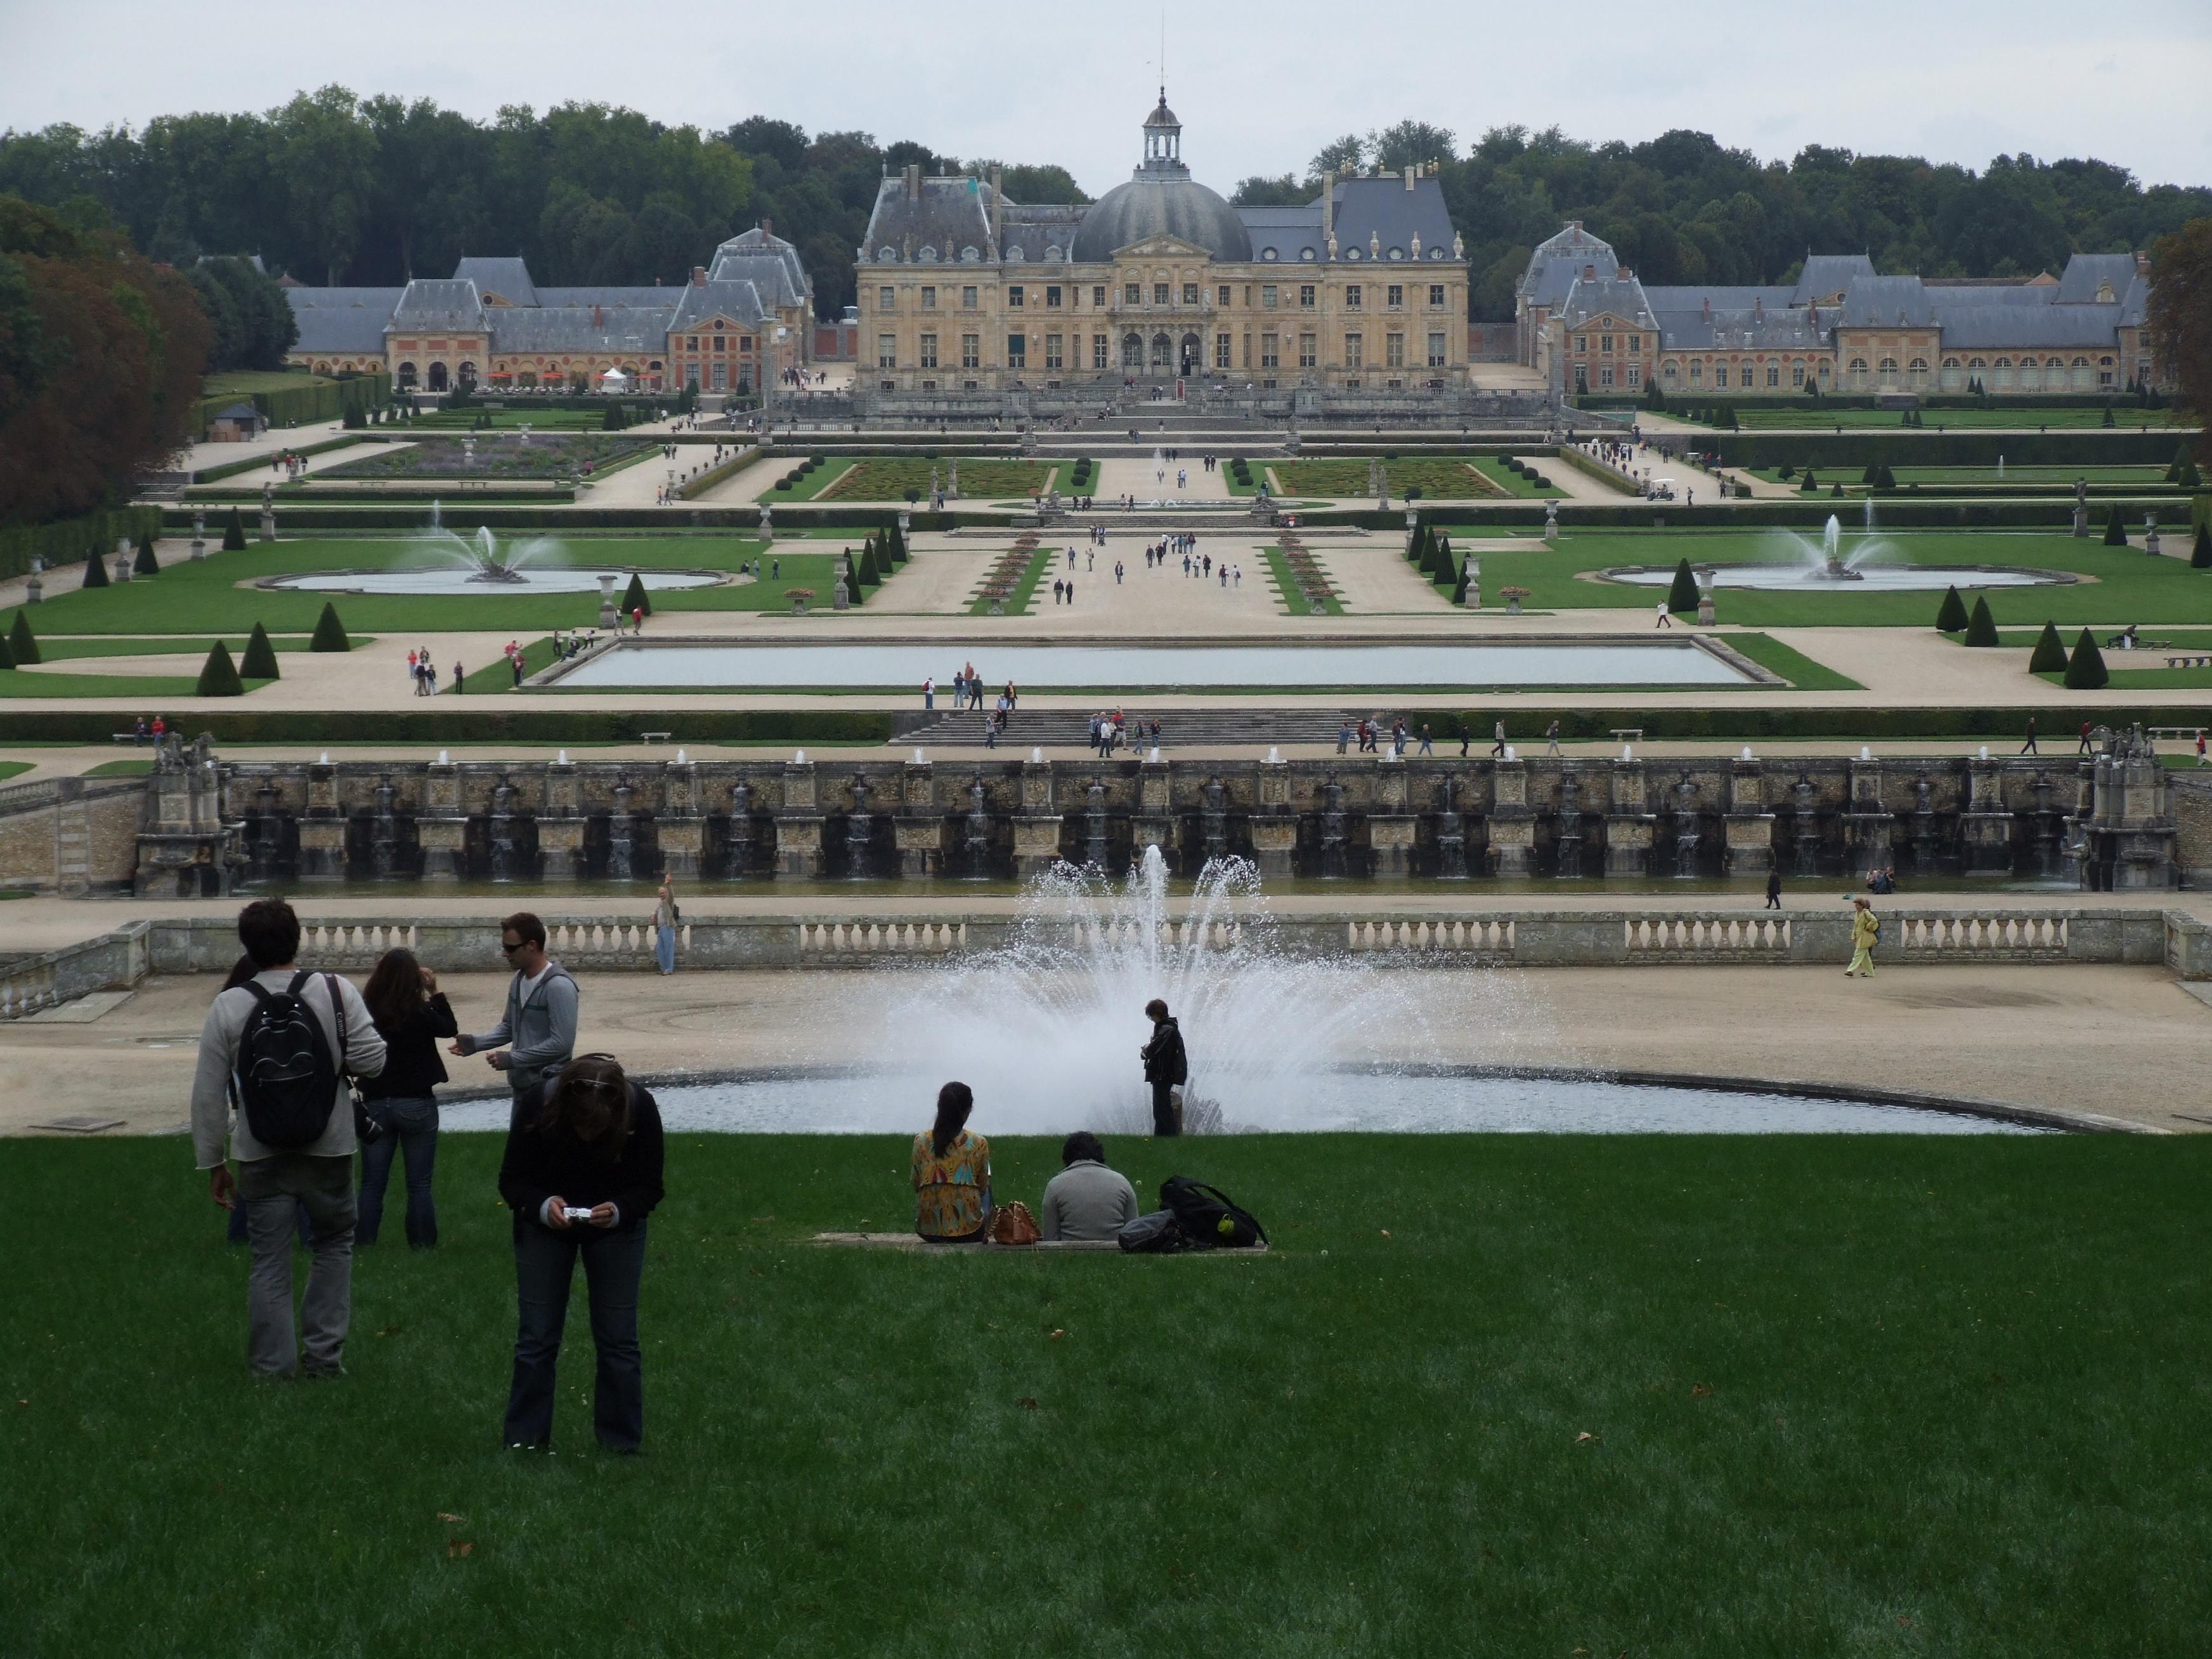 Image of Chateau Vaux-le-Vicomte